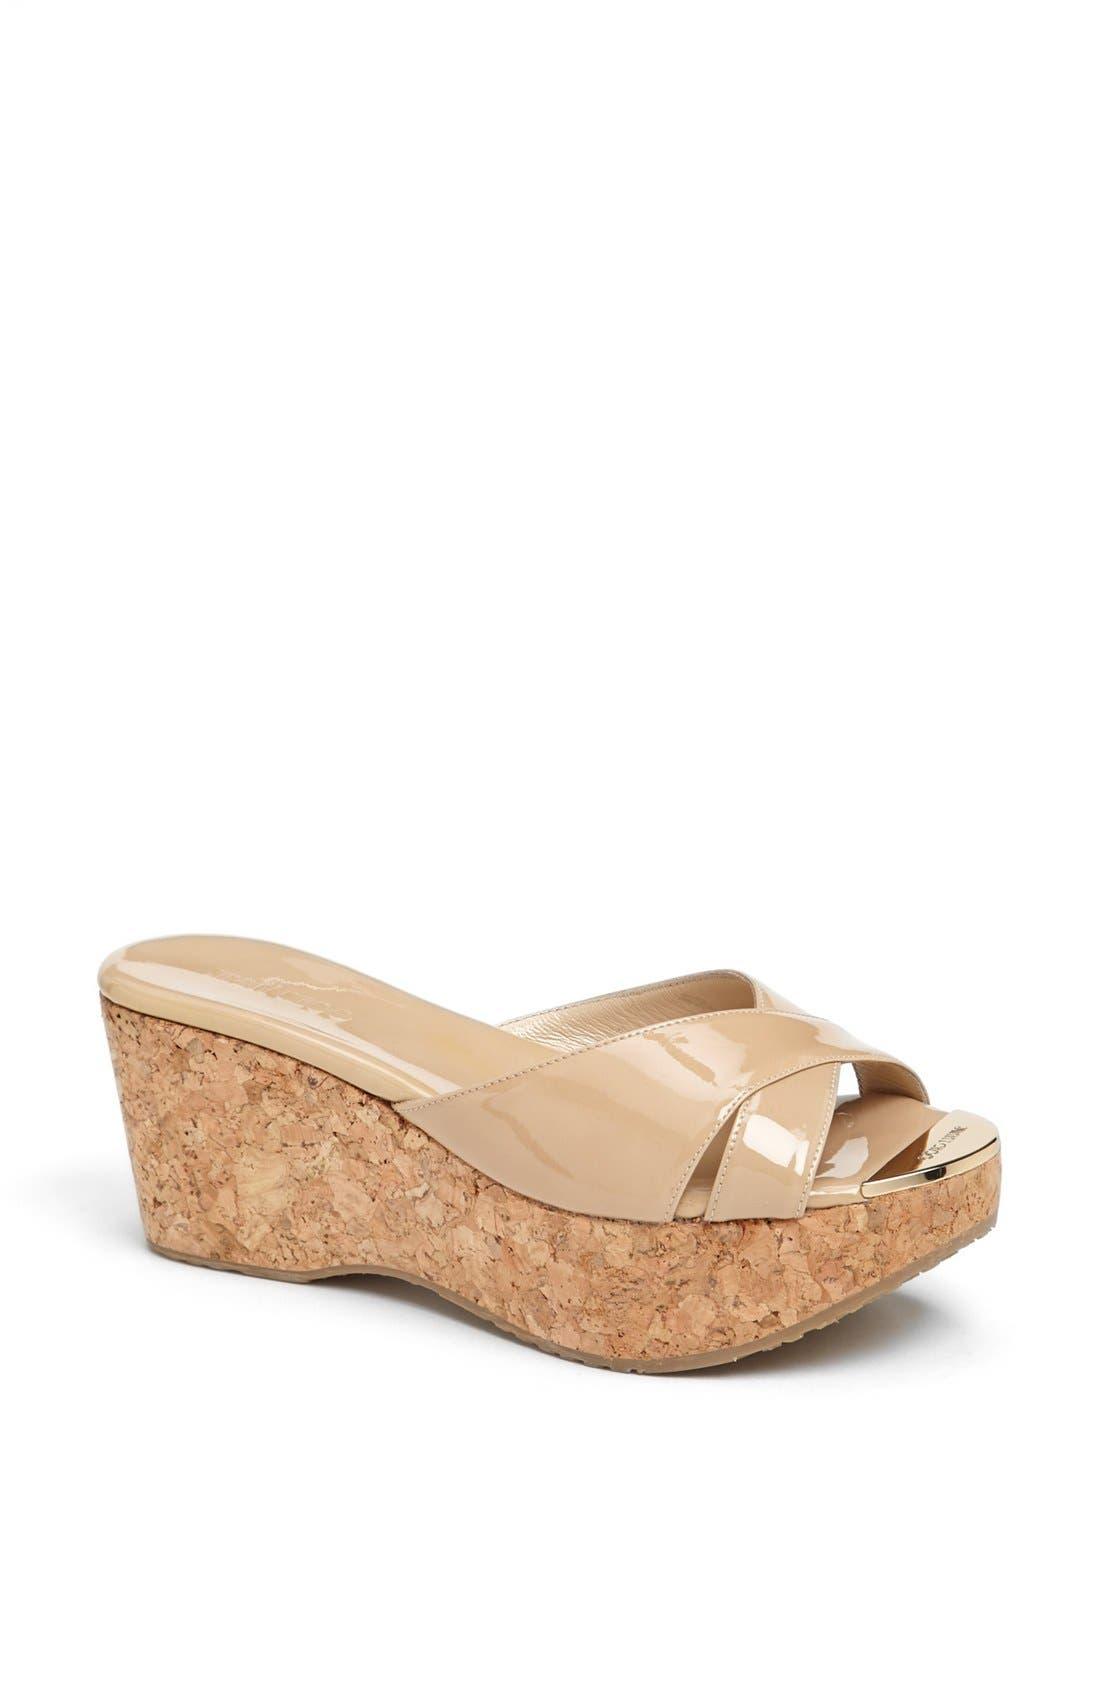 Main Image - Jimmy Choo 'Prima' Cork Platform Sandal (Women)